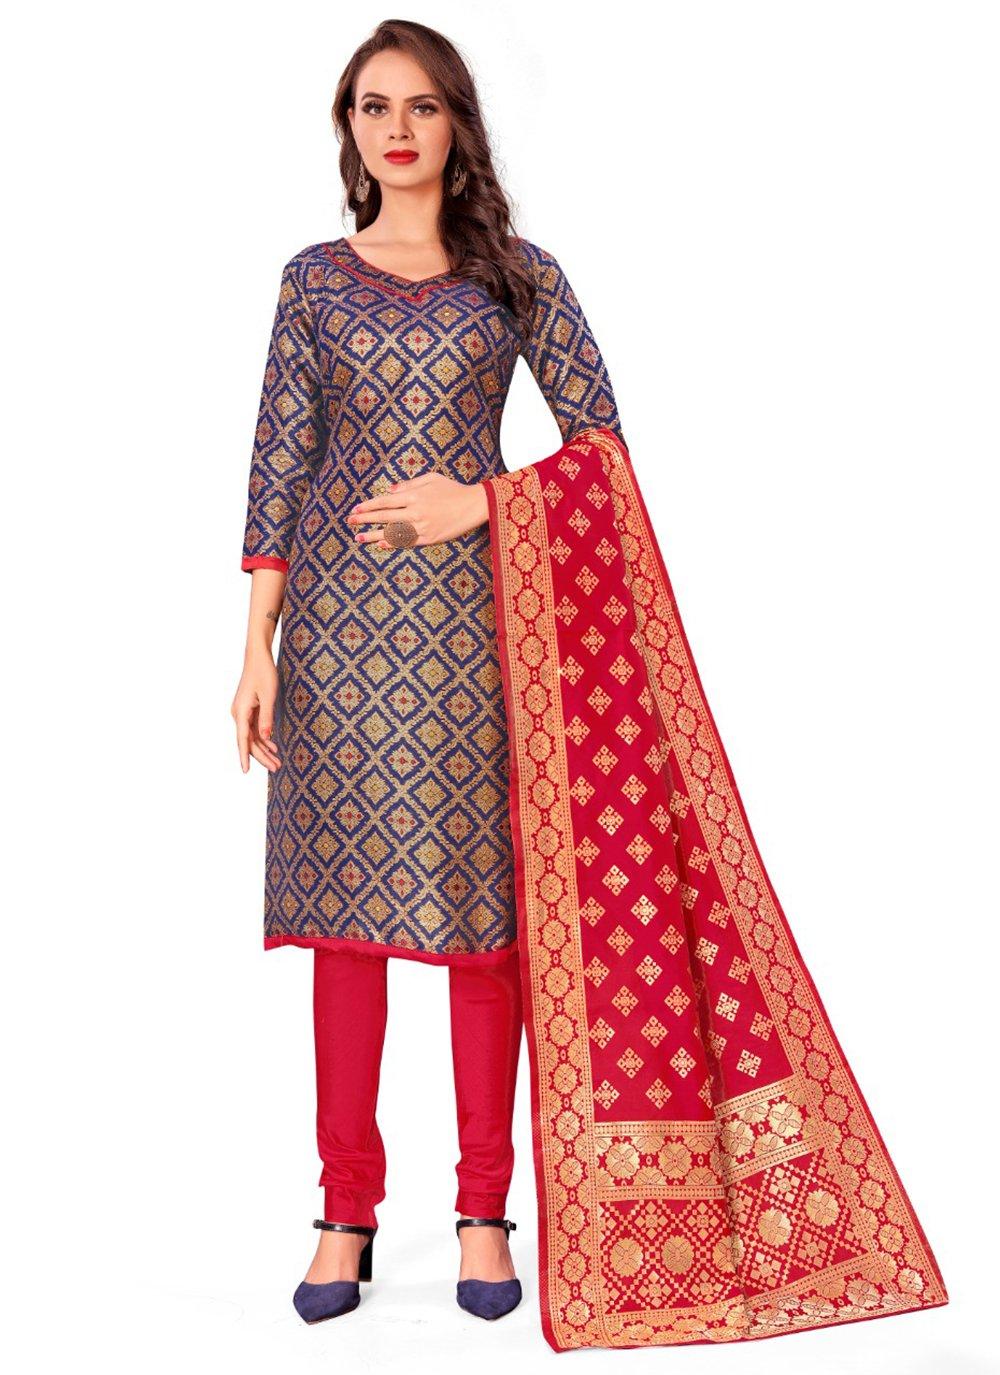 Jacquard Work Blue Banarasi Silk Churidar Designer Suit